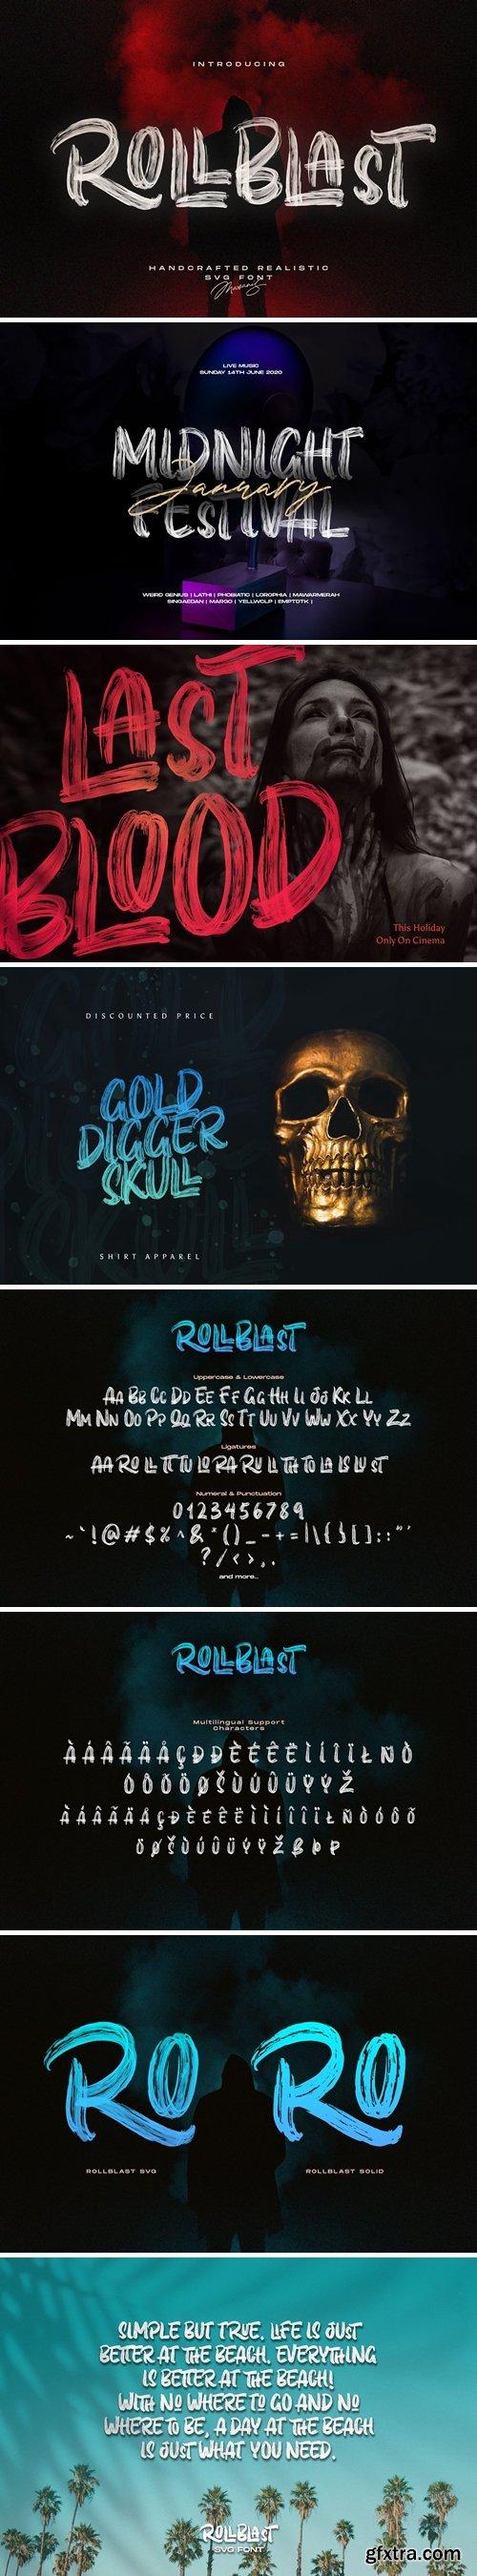 CreativeMarket - ROLLBLAST - Display Font 4971523